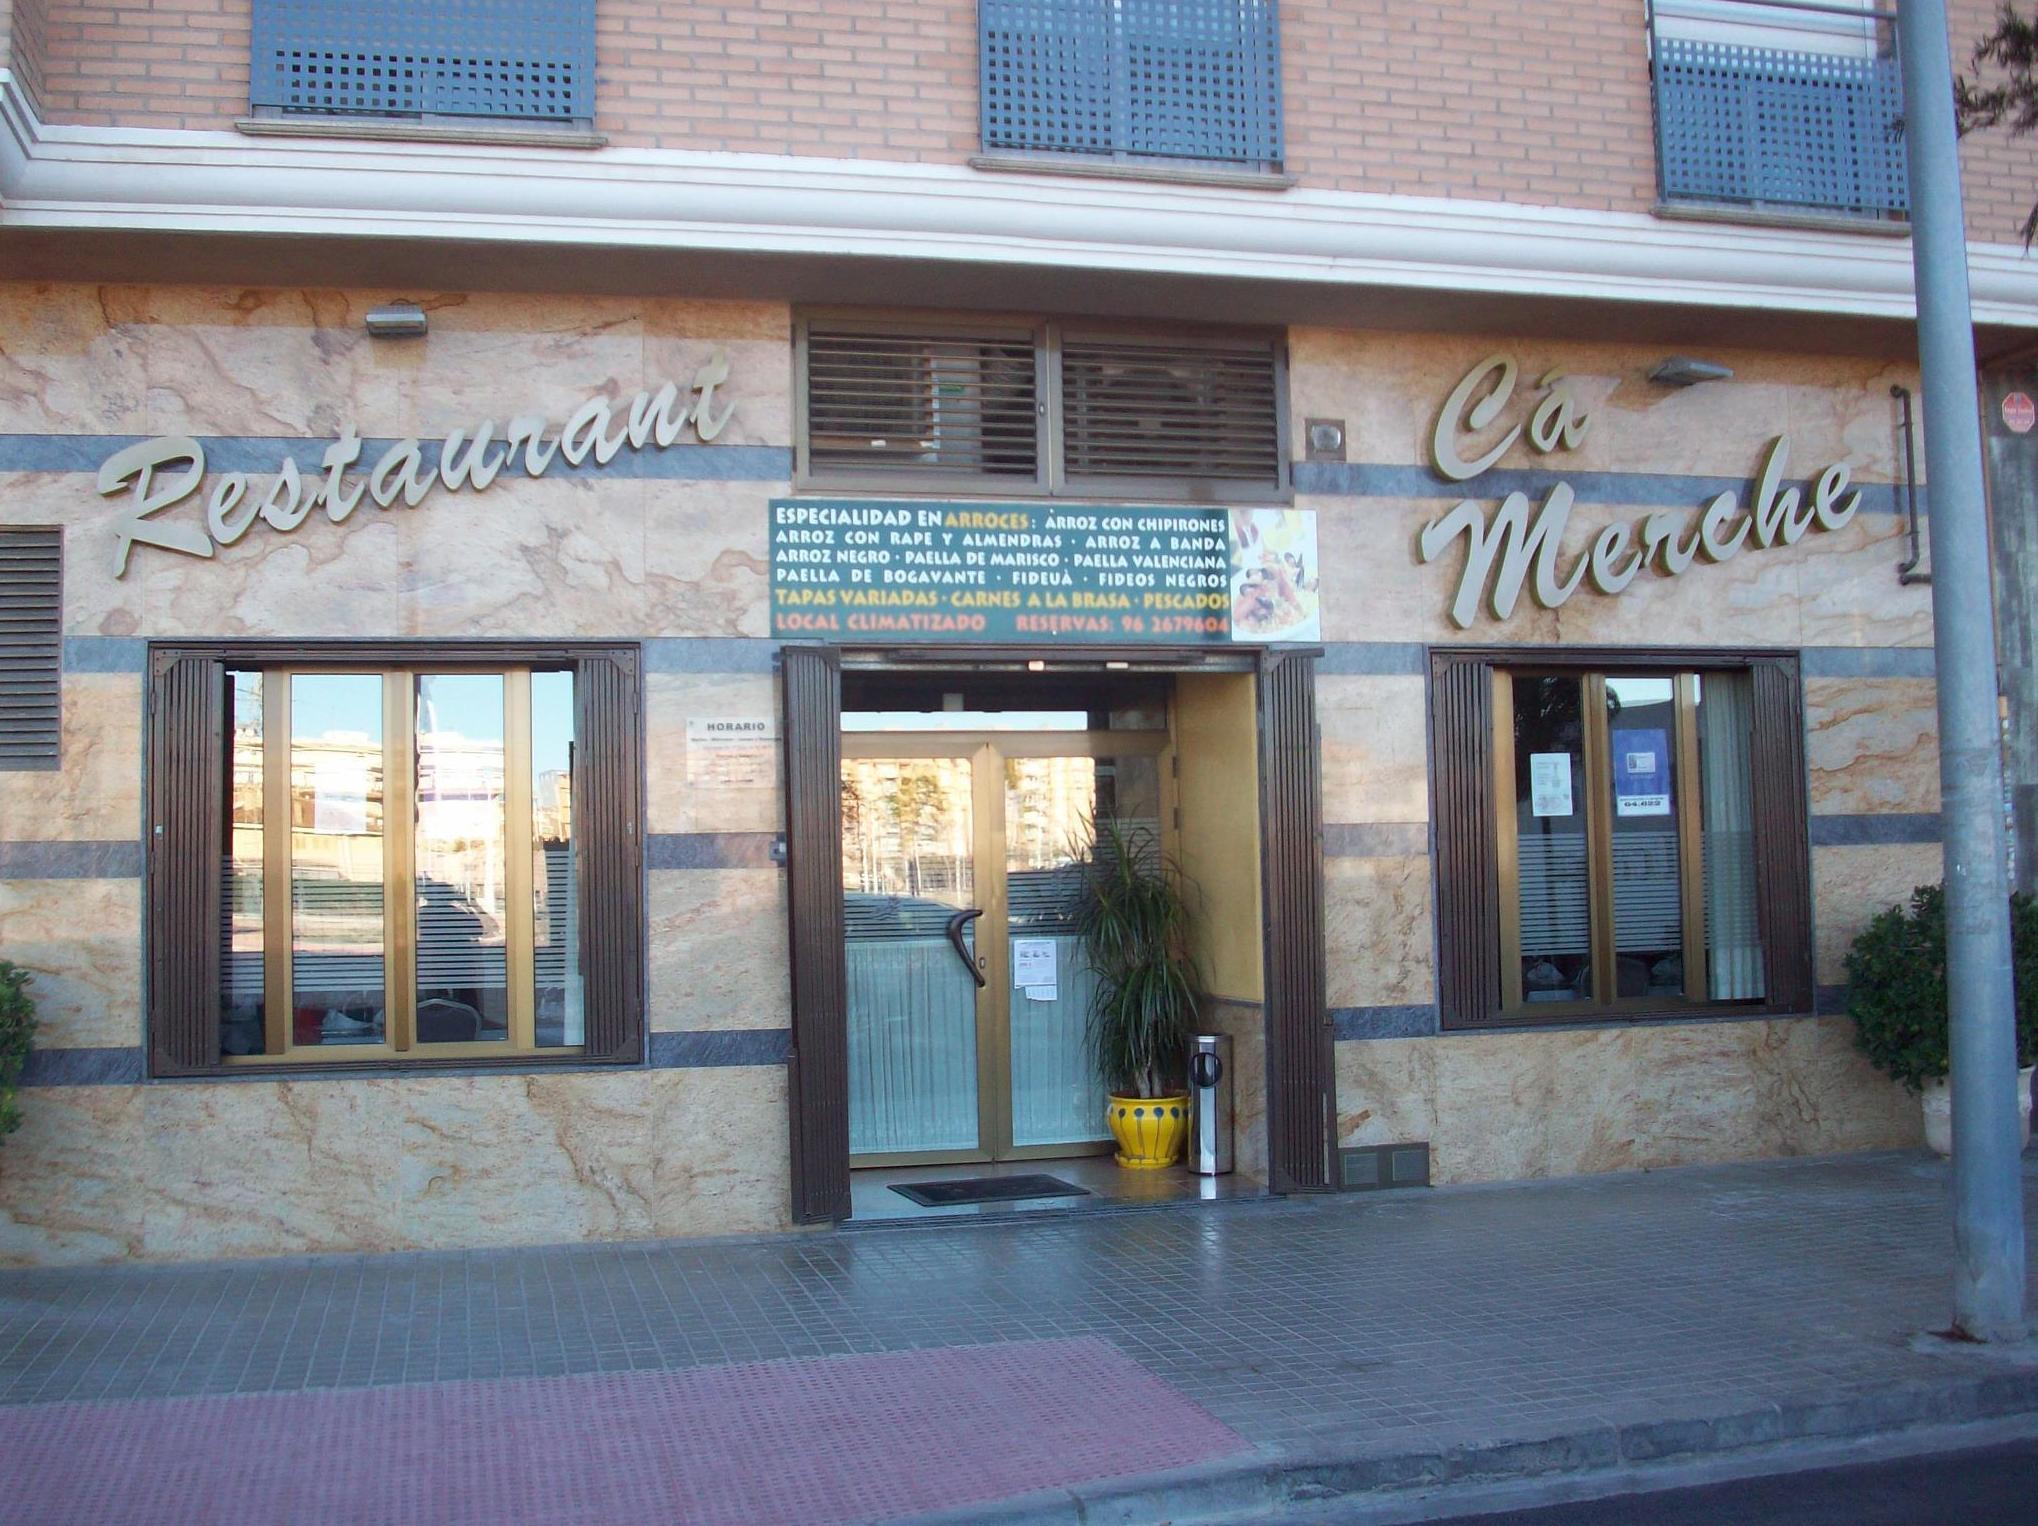 Semana Santa 2016 Sagunto / Arroceria Ca' Merche  en Sagunto